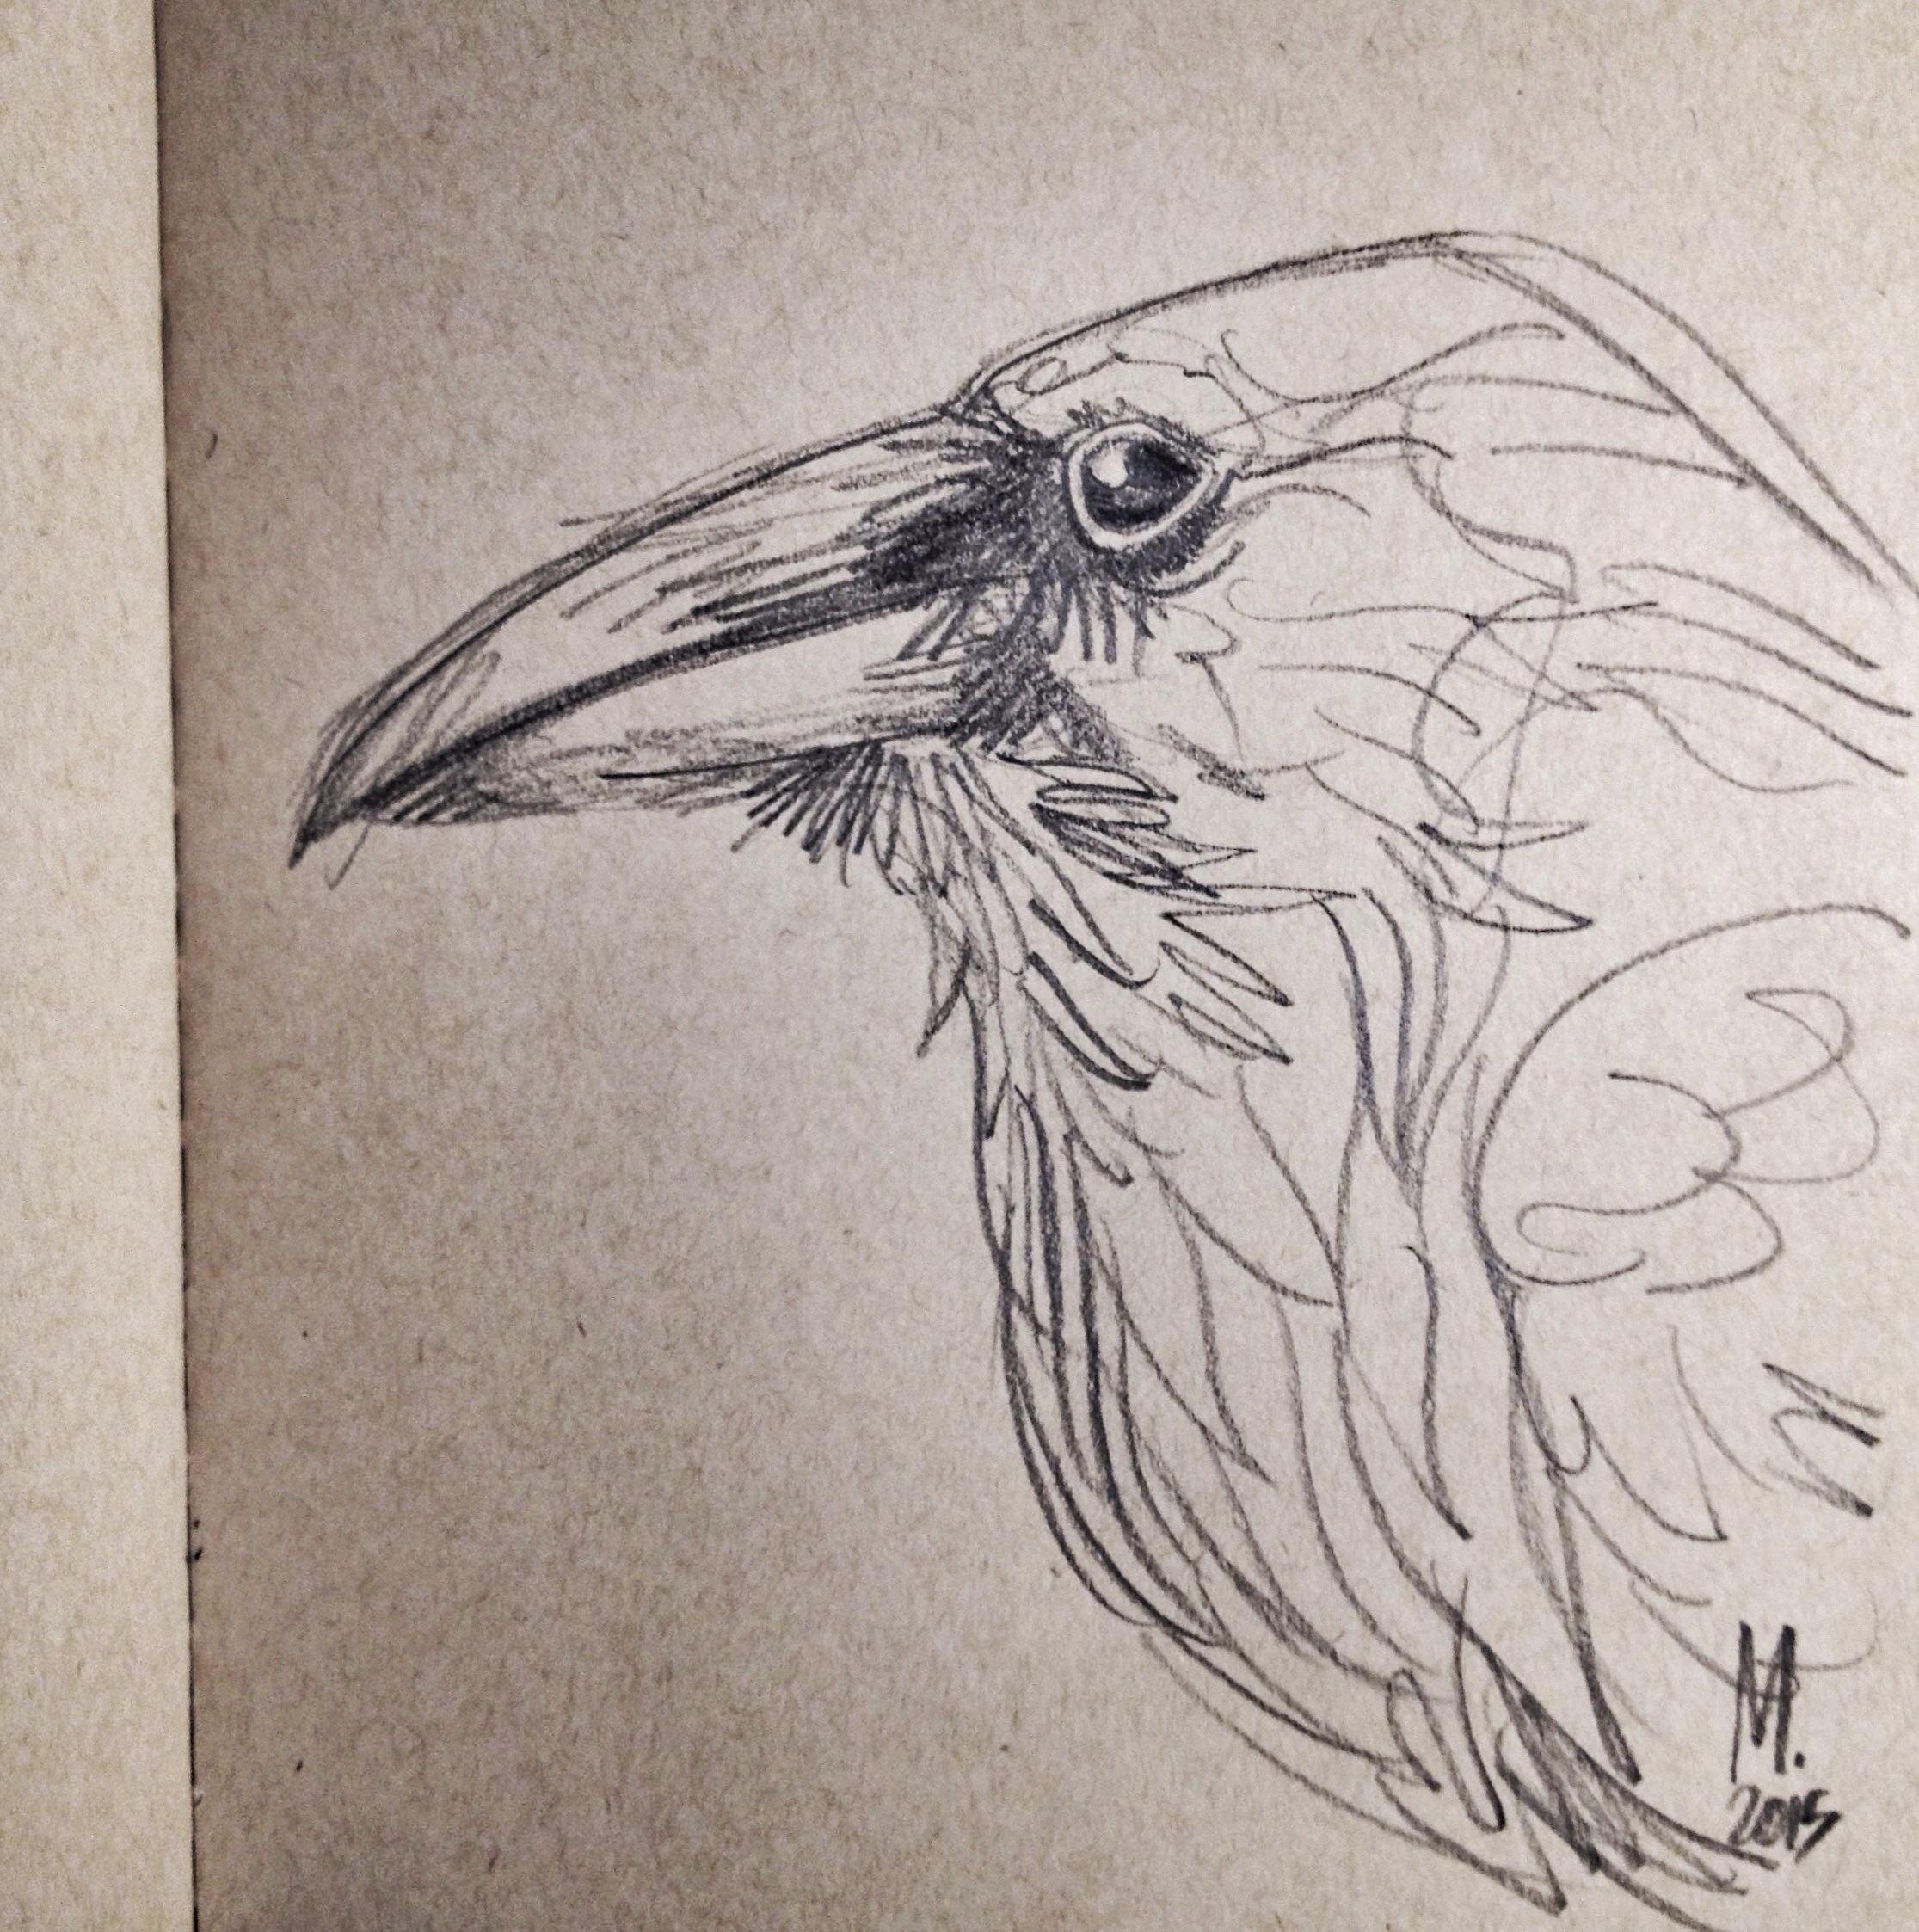 Blackbird with blackwing.